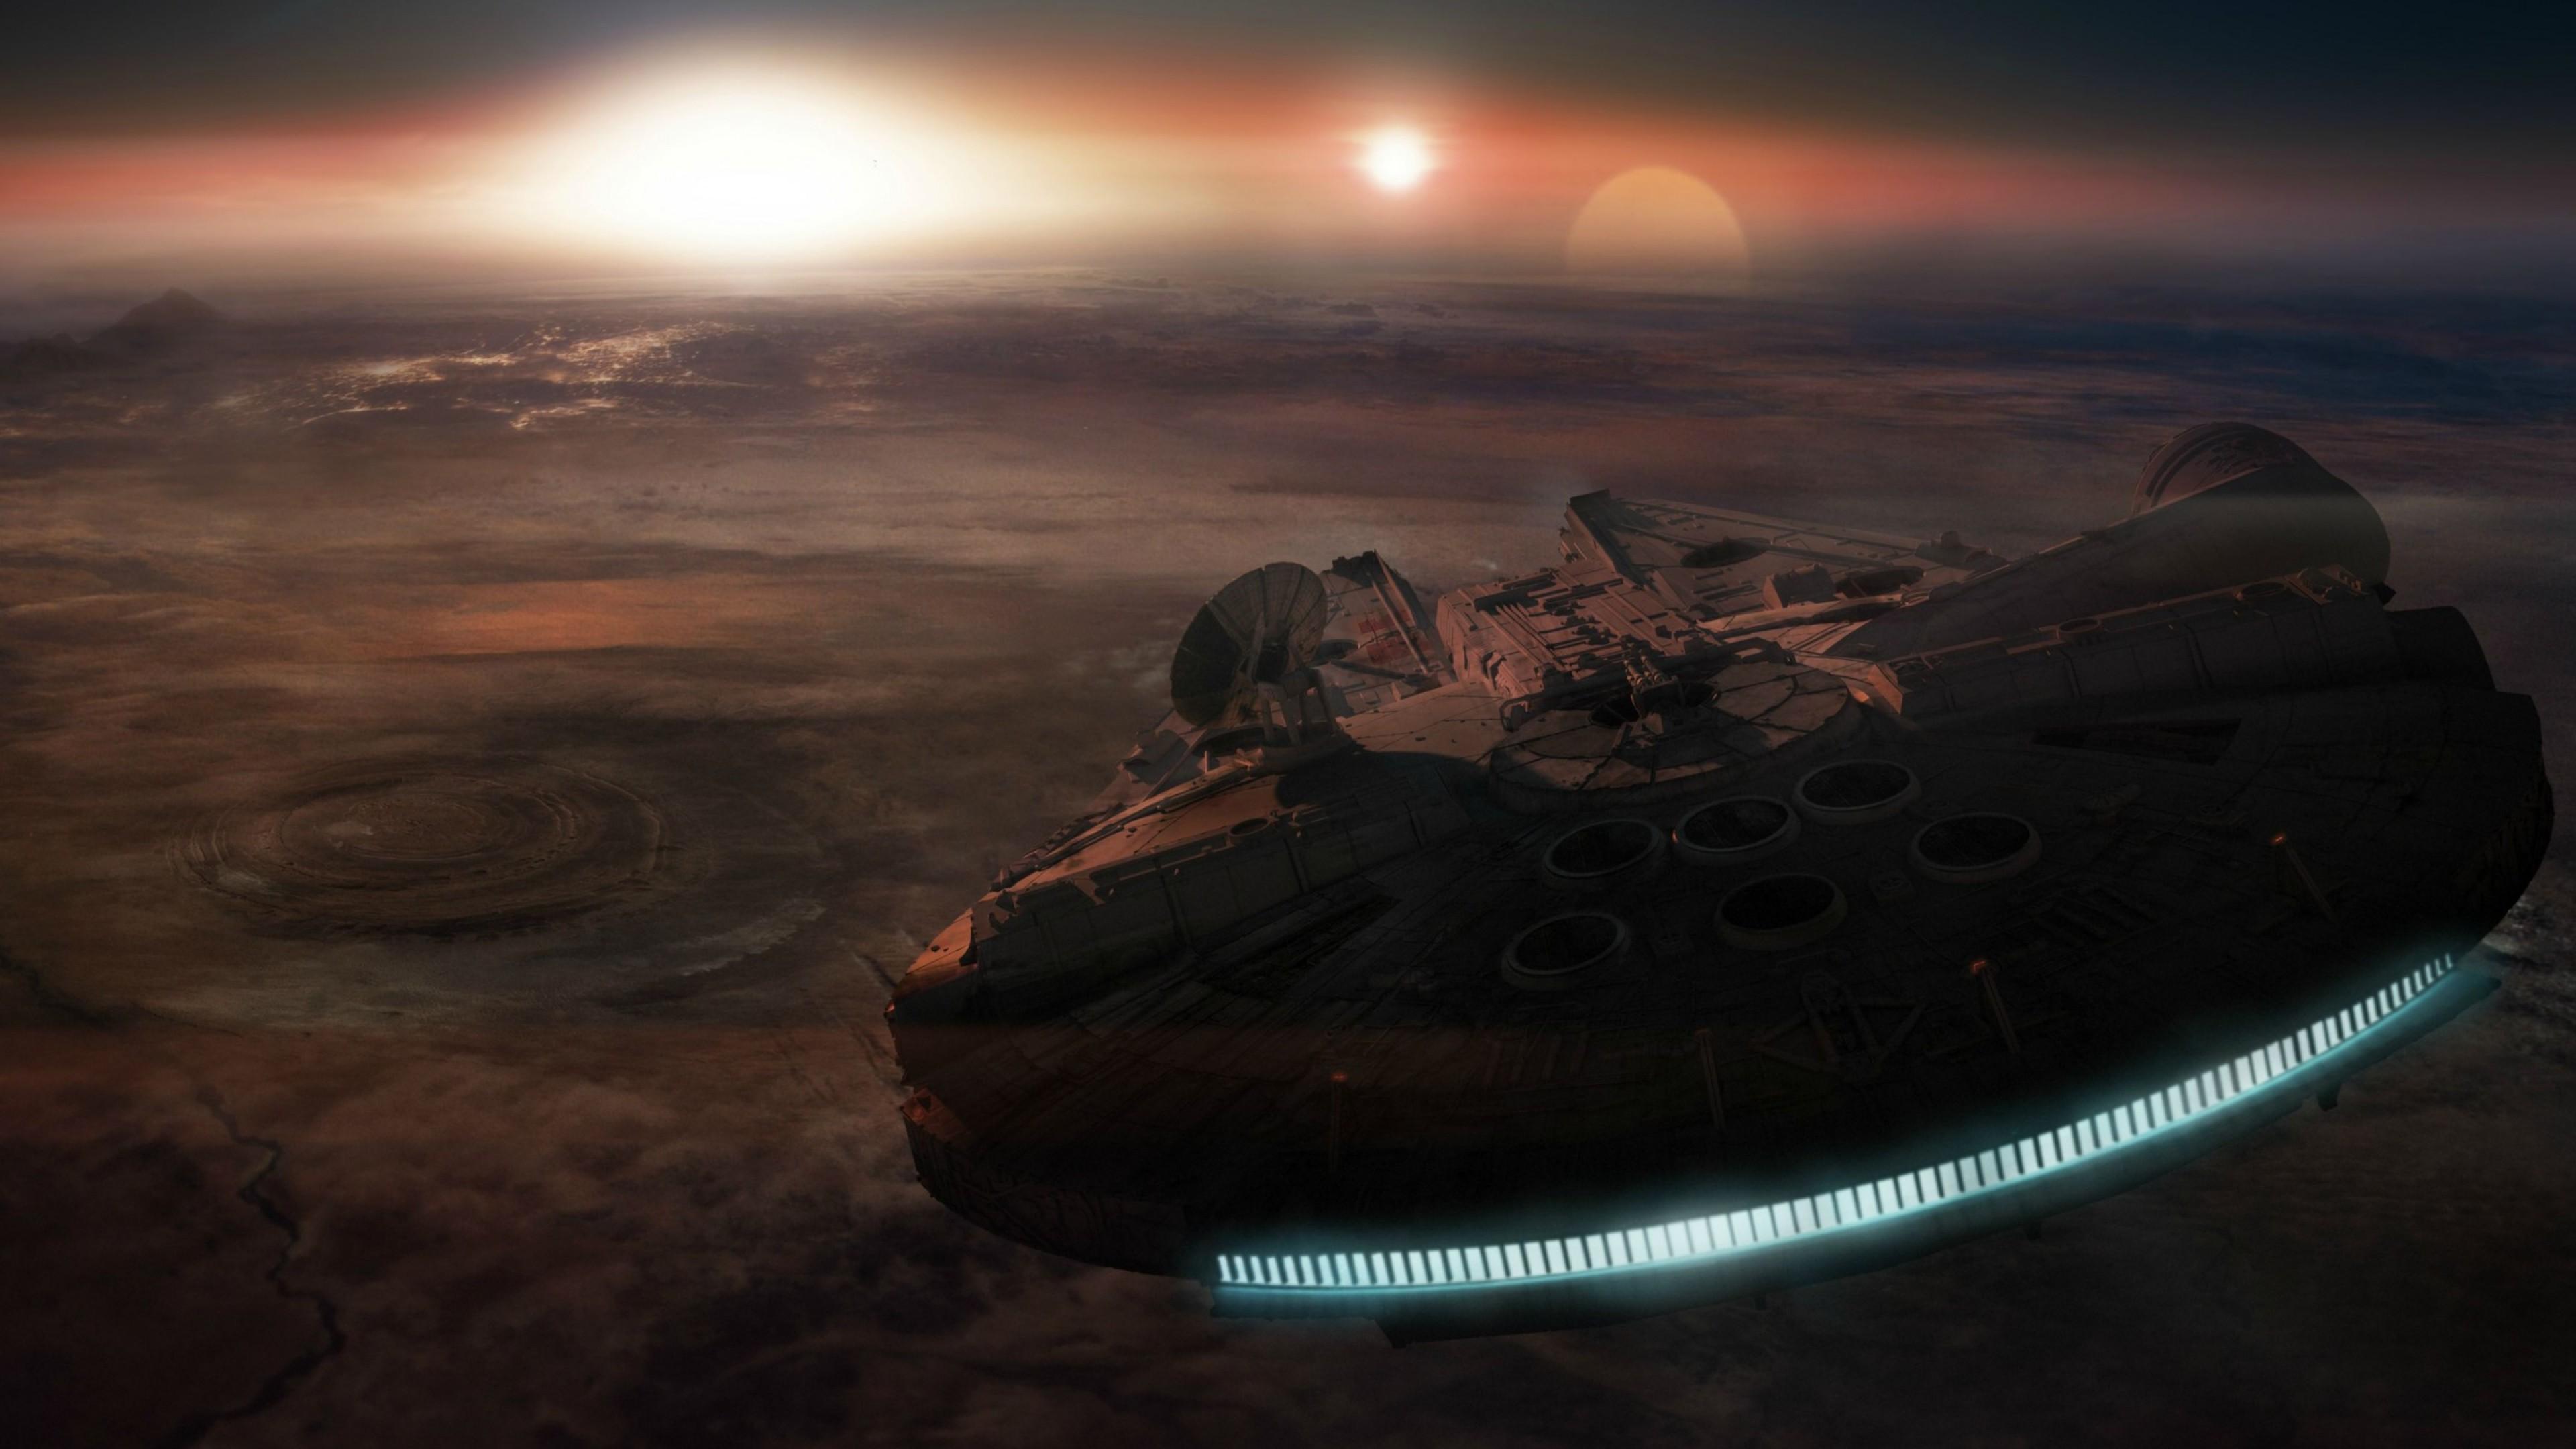 Star Wars Episode Vii The Force Awakens Wallpaper For Desktop And